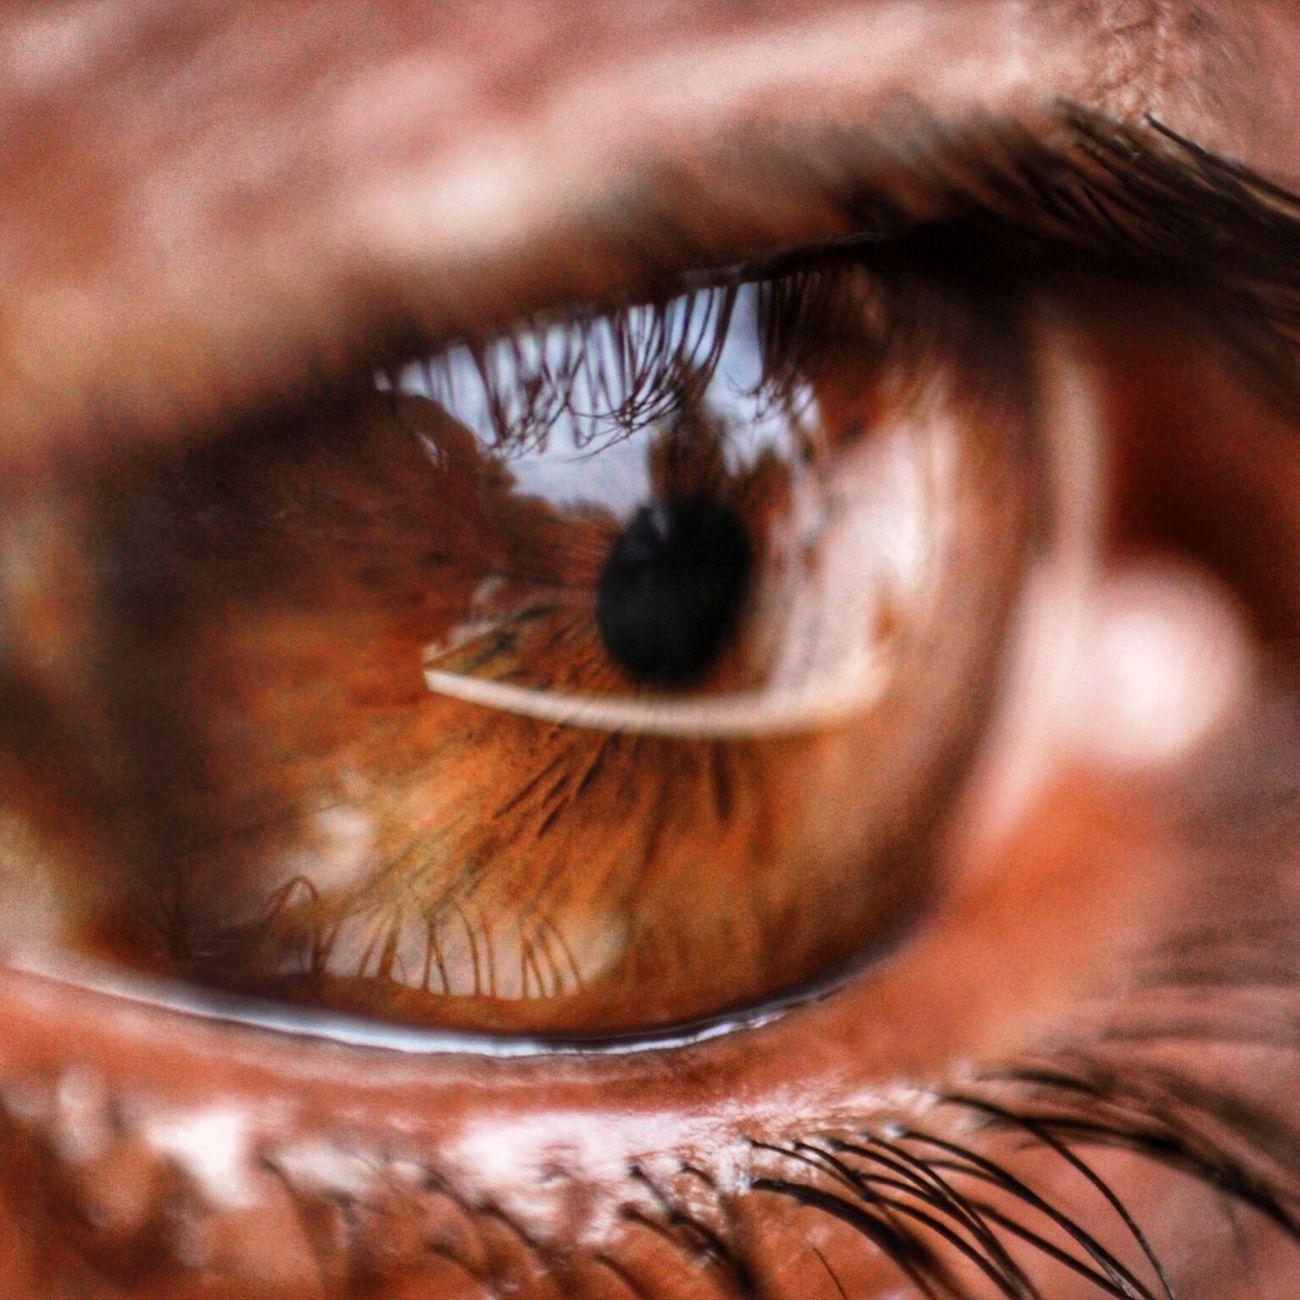 Eye😍 Human Eye Sensory Perception Eyesight Eyelash 600D Iris - Eye Eyeball Extreme Close-up Close-up Real People Unrecognizable Person Macro Brown Eyes Reflection One Person Hazel Eyes  People Outdoors Vision Day